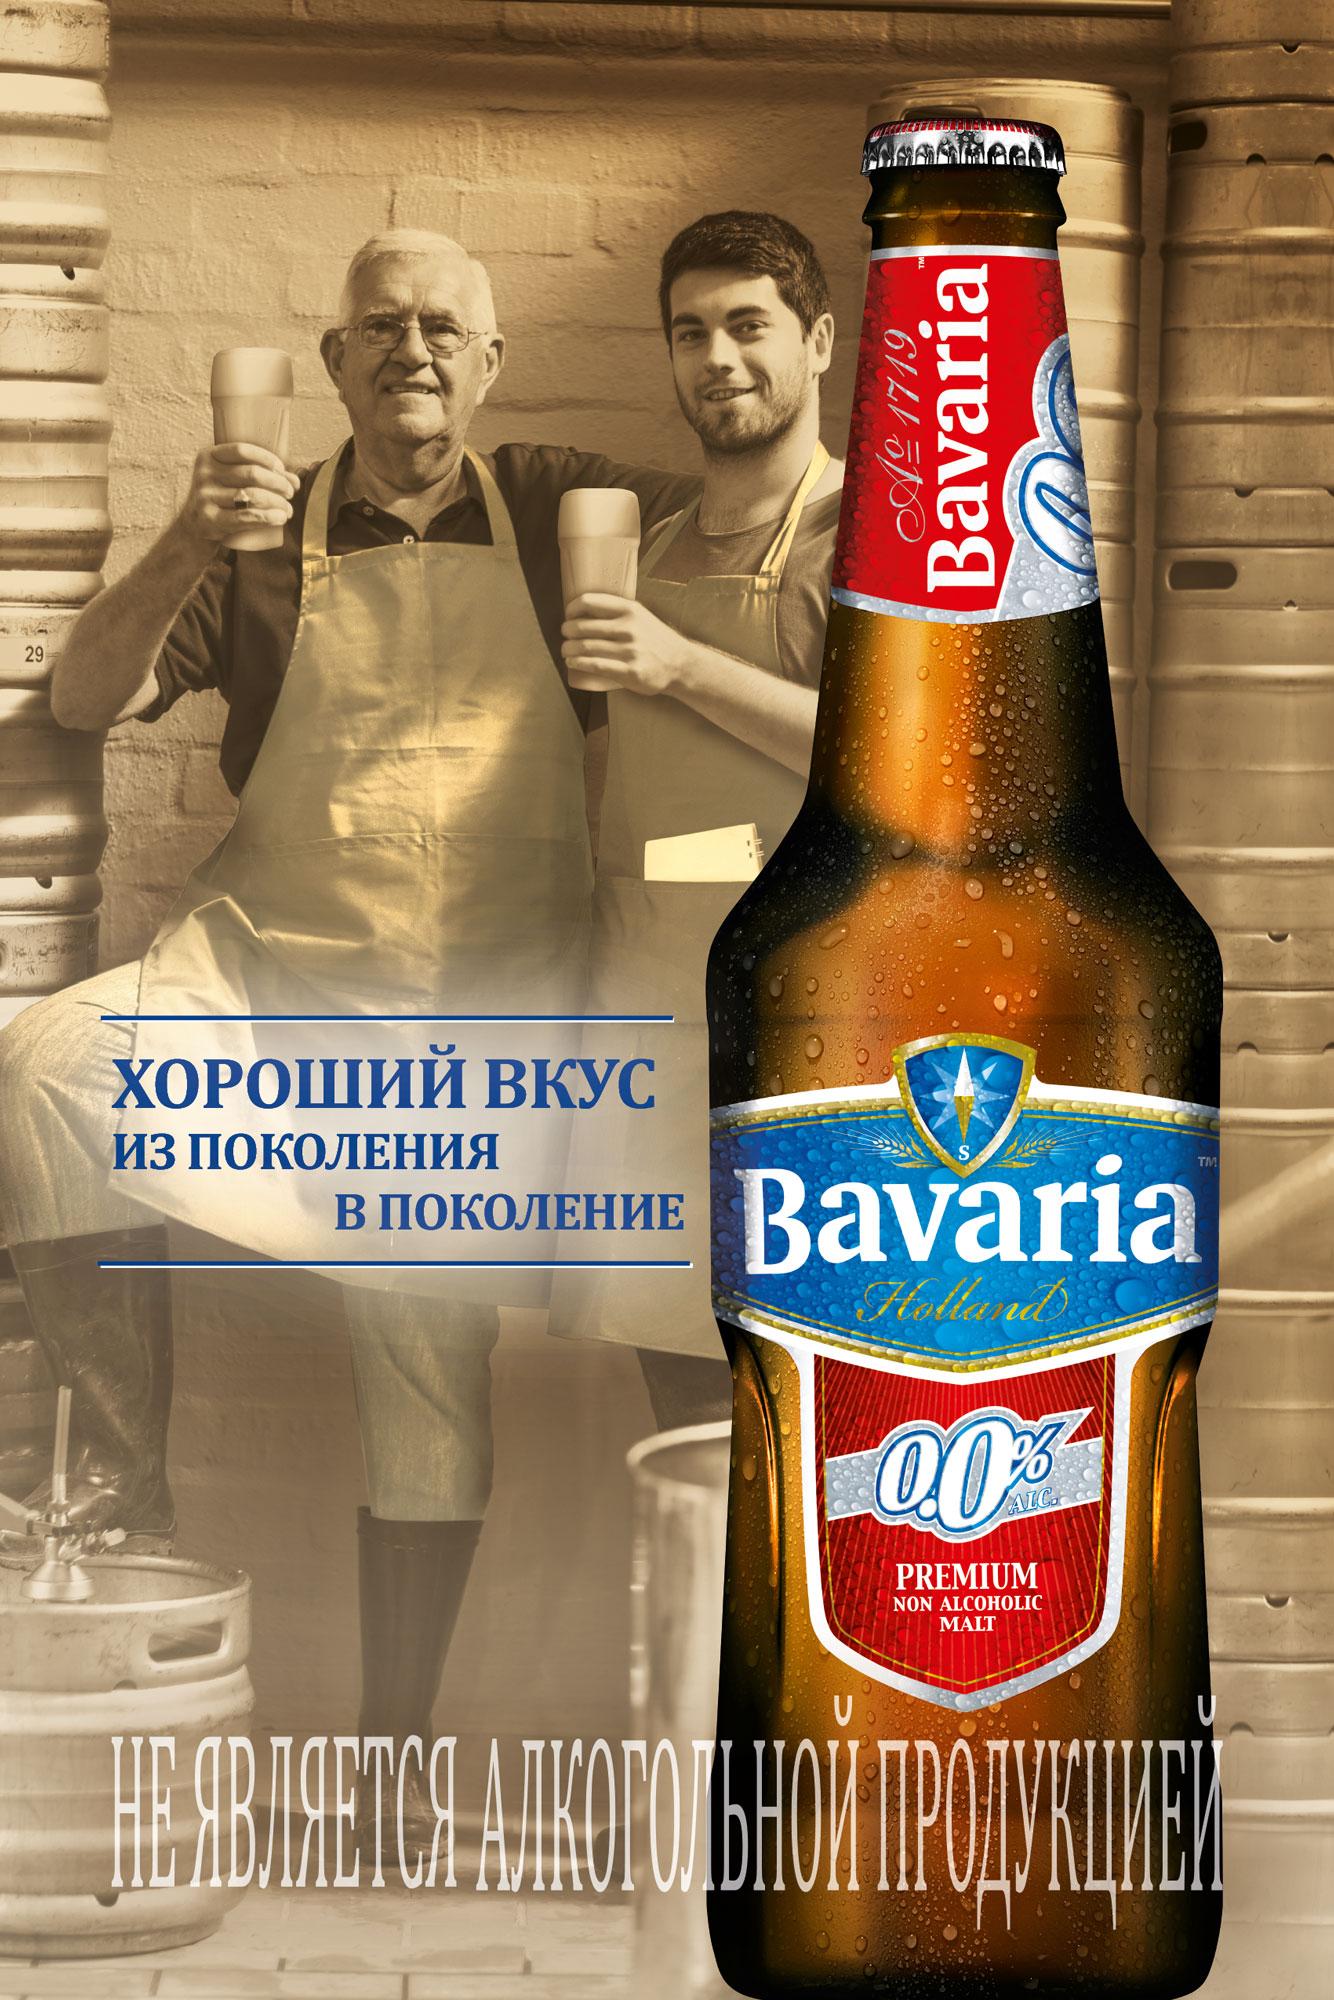 Bavaria_OOH_120x180_v4_preview